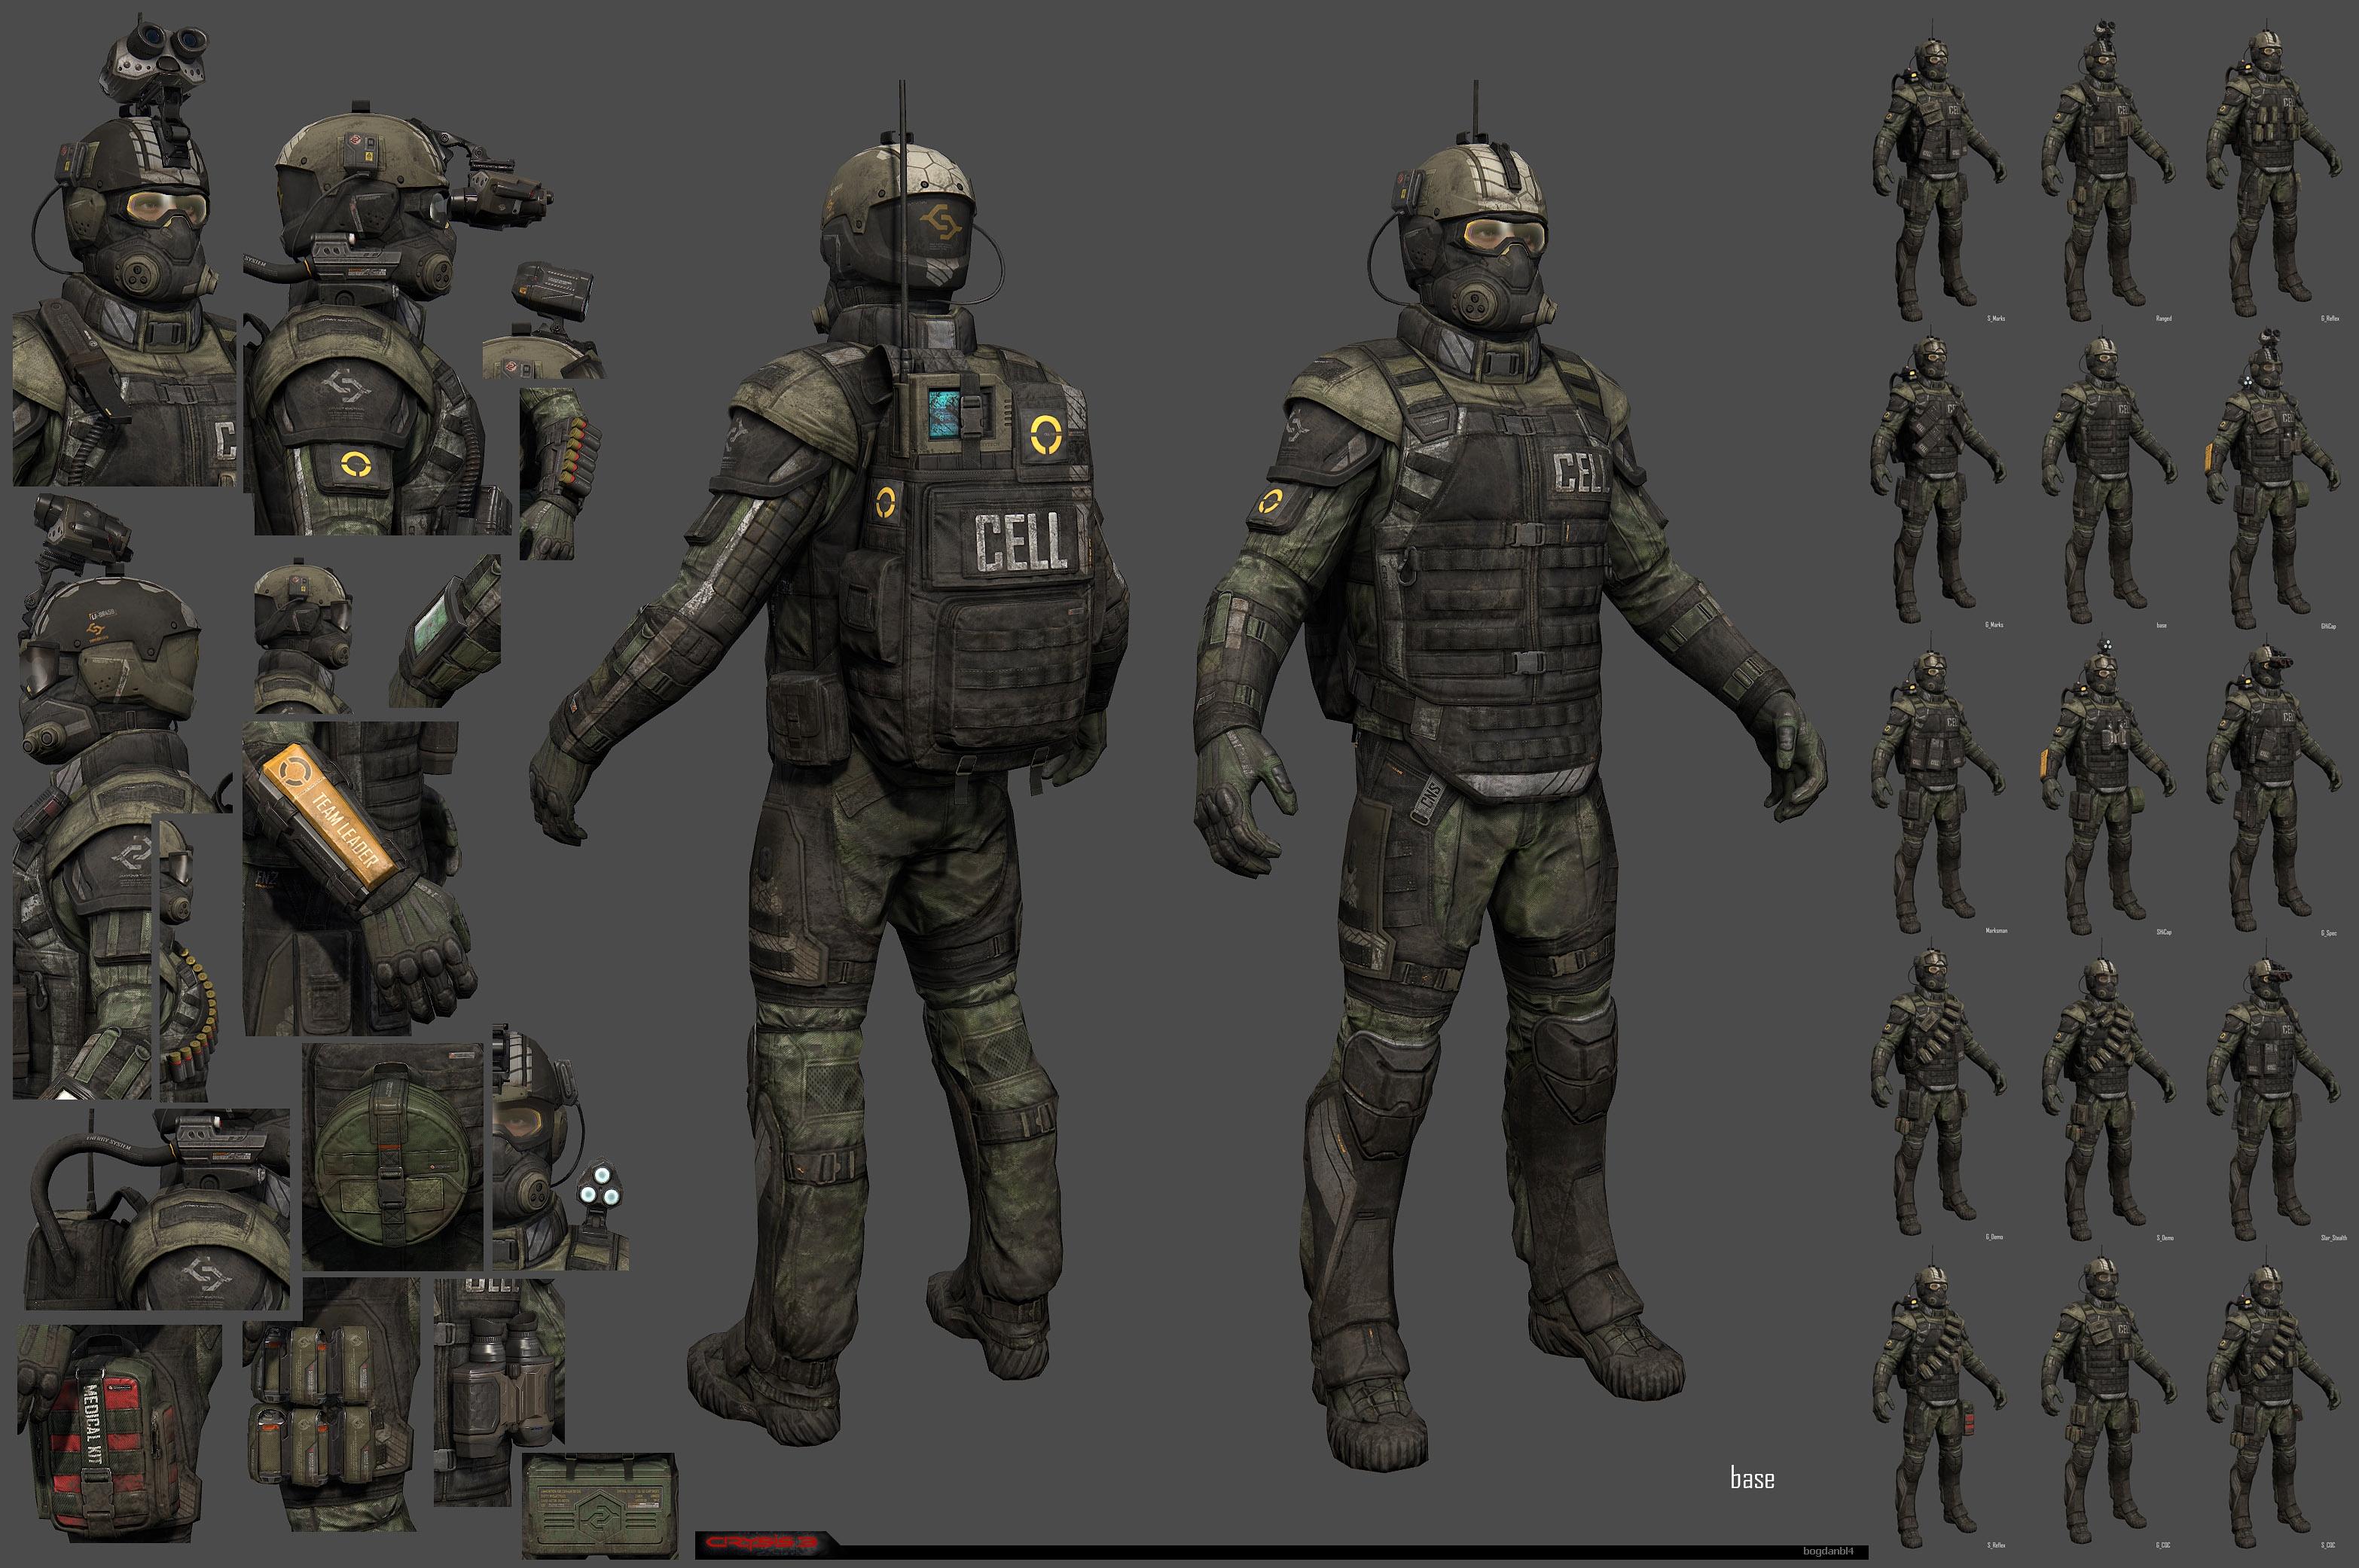 Bogdanbl4-cell-trooper-modifications by Bogdanbl4